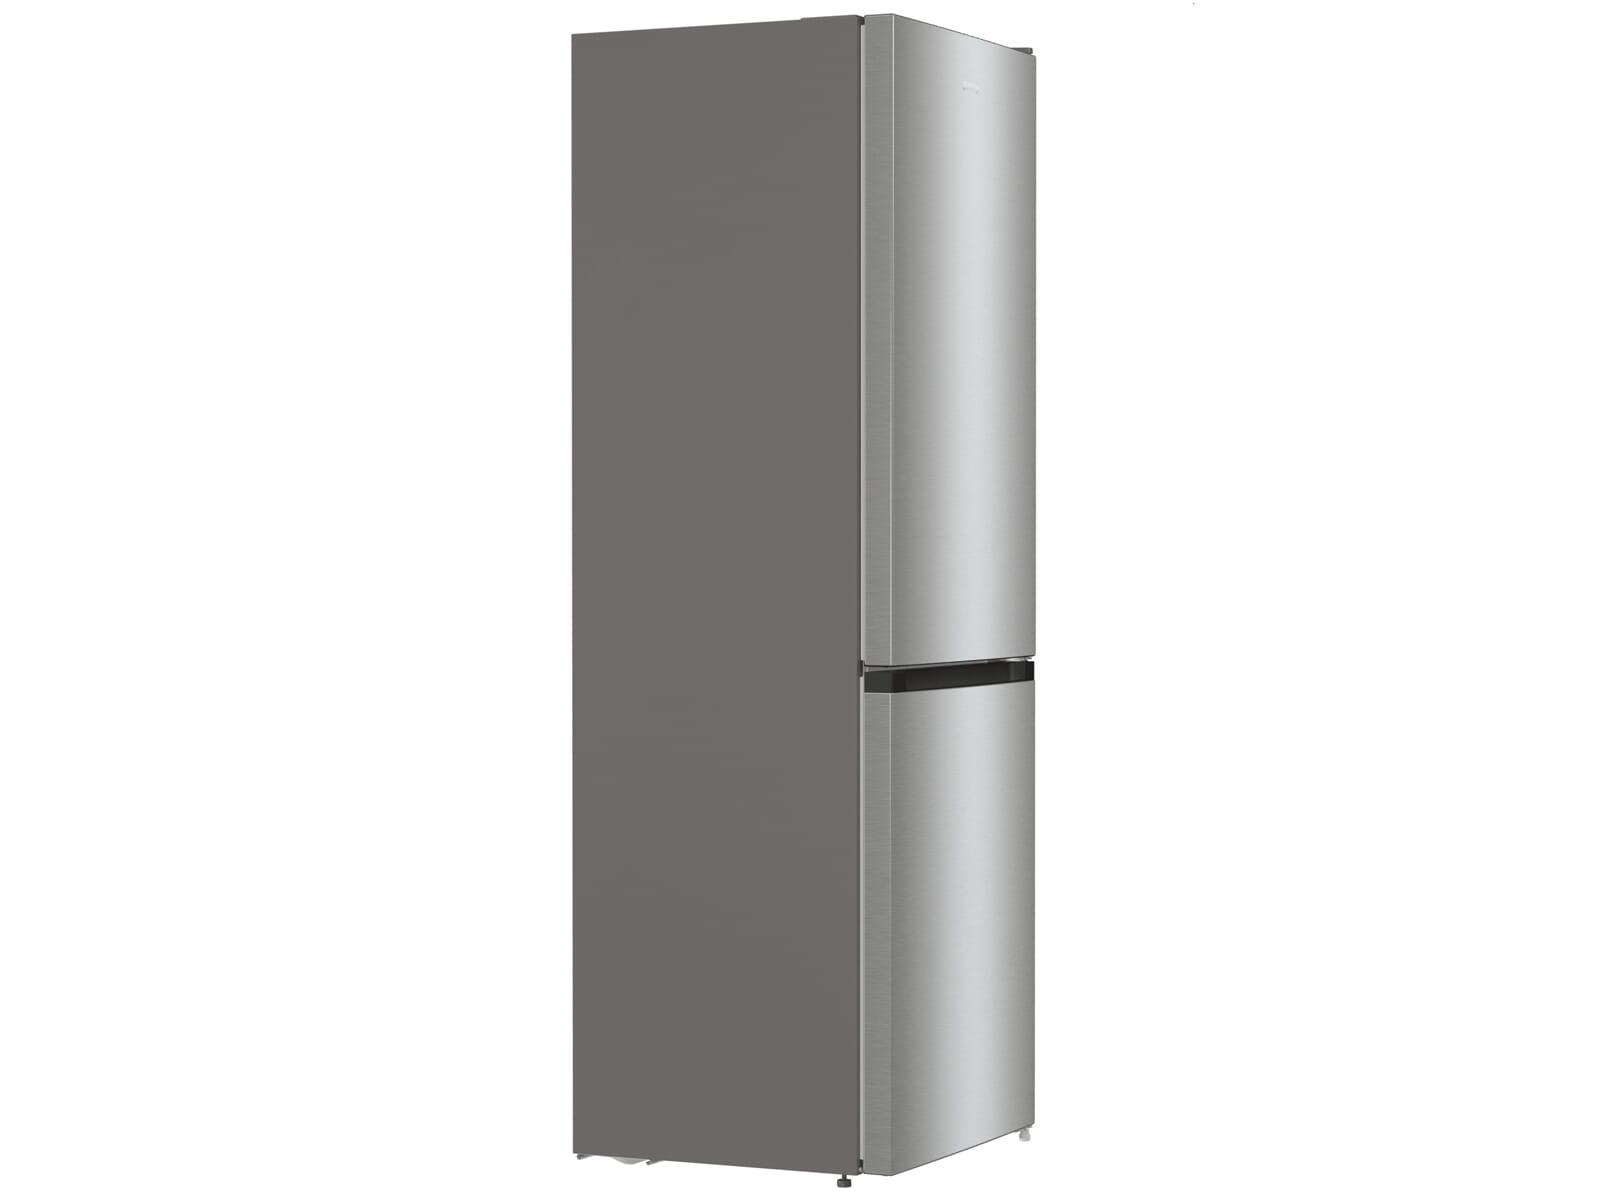 Gorenje RK 6192 AXL4 Kühl-Gefrier-Kombination Grau Metallic